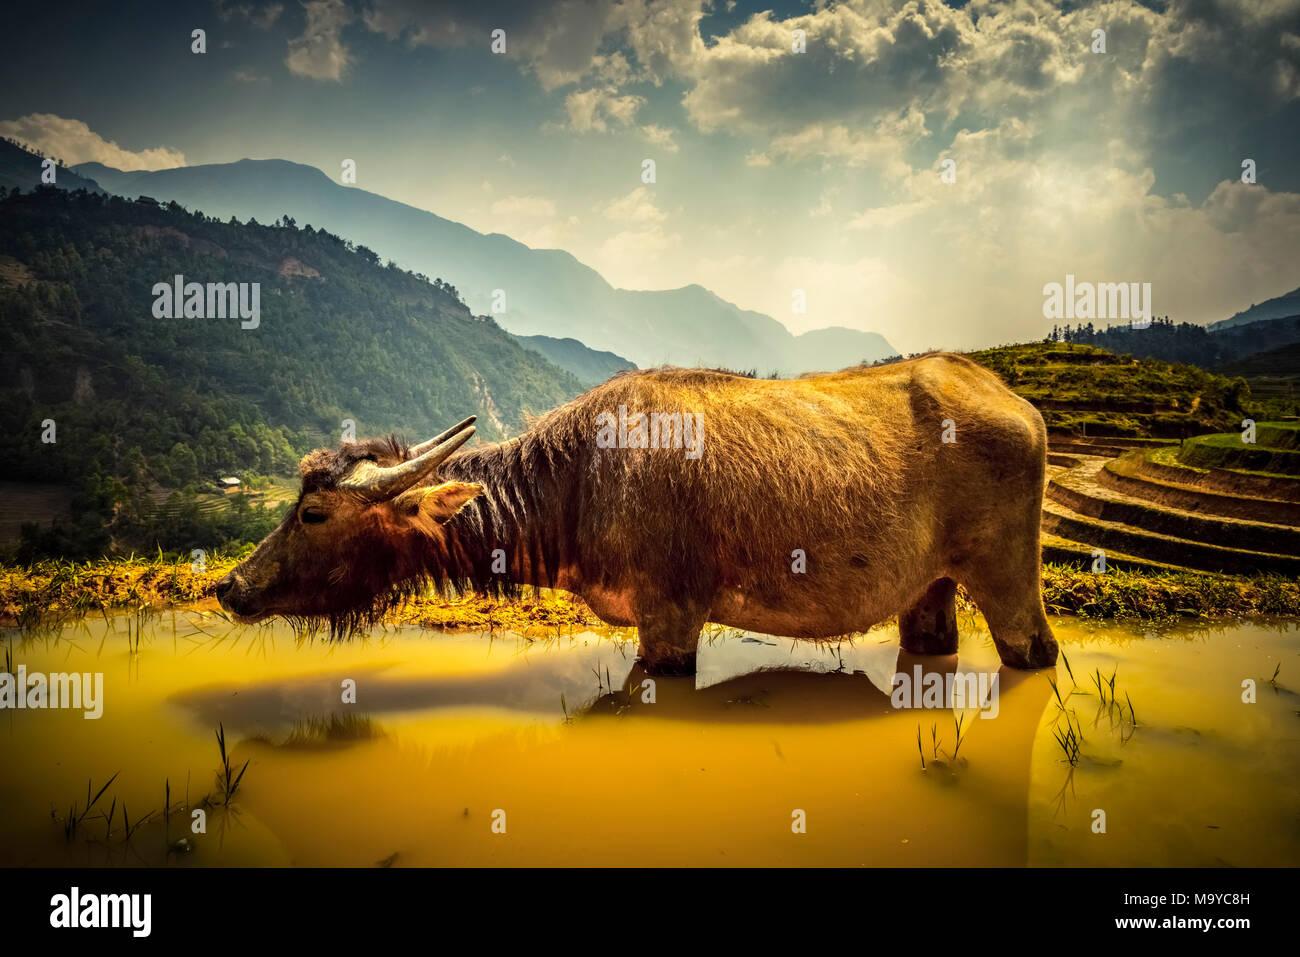 Asien, Südostasien, Nordvietnam, Vietnam, Sapa, Berge, Bergwelt Stockbild